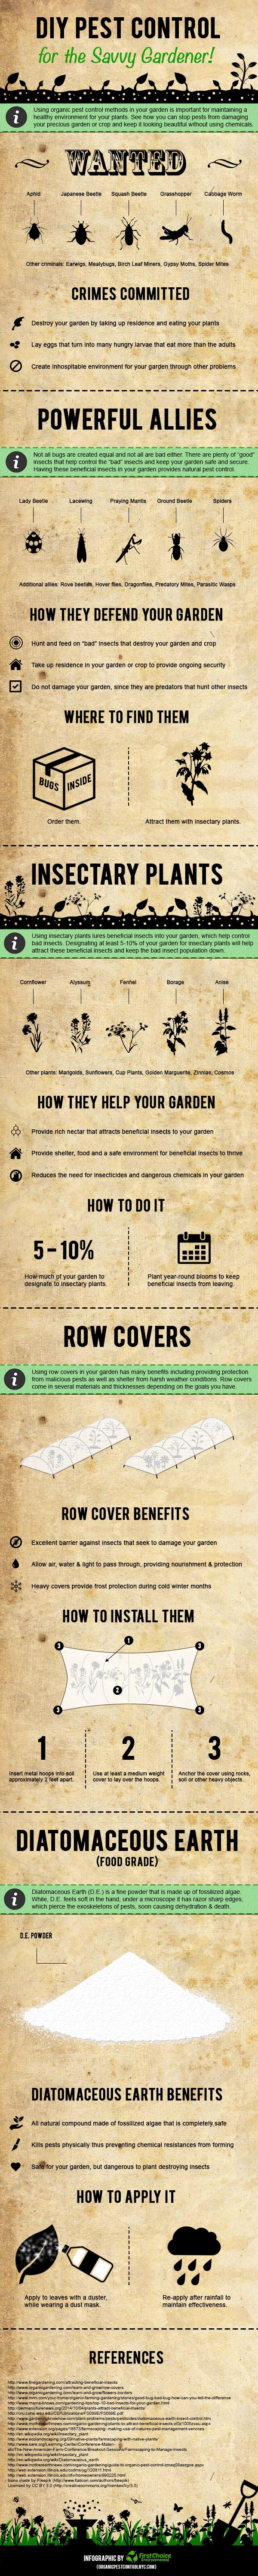 diy-garden-organic-pest-control-infographic